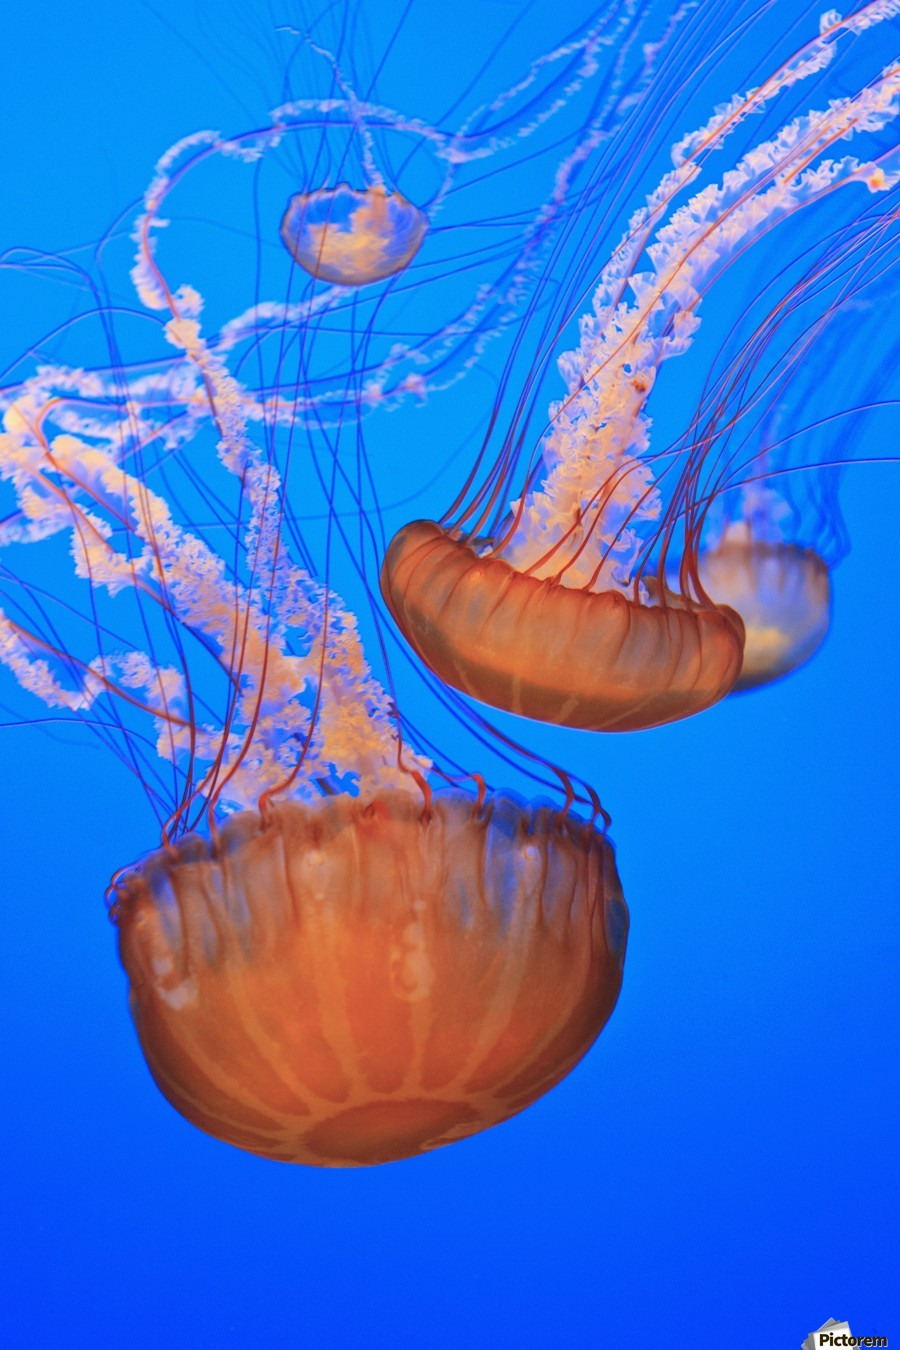 Sea Nettles (Chrysaora Fuscescens) In Monterey Bay Aquarium Display; Monterey, California, United States of America  Print